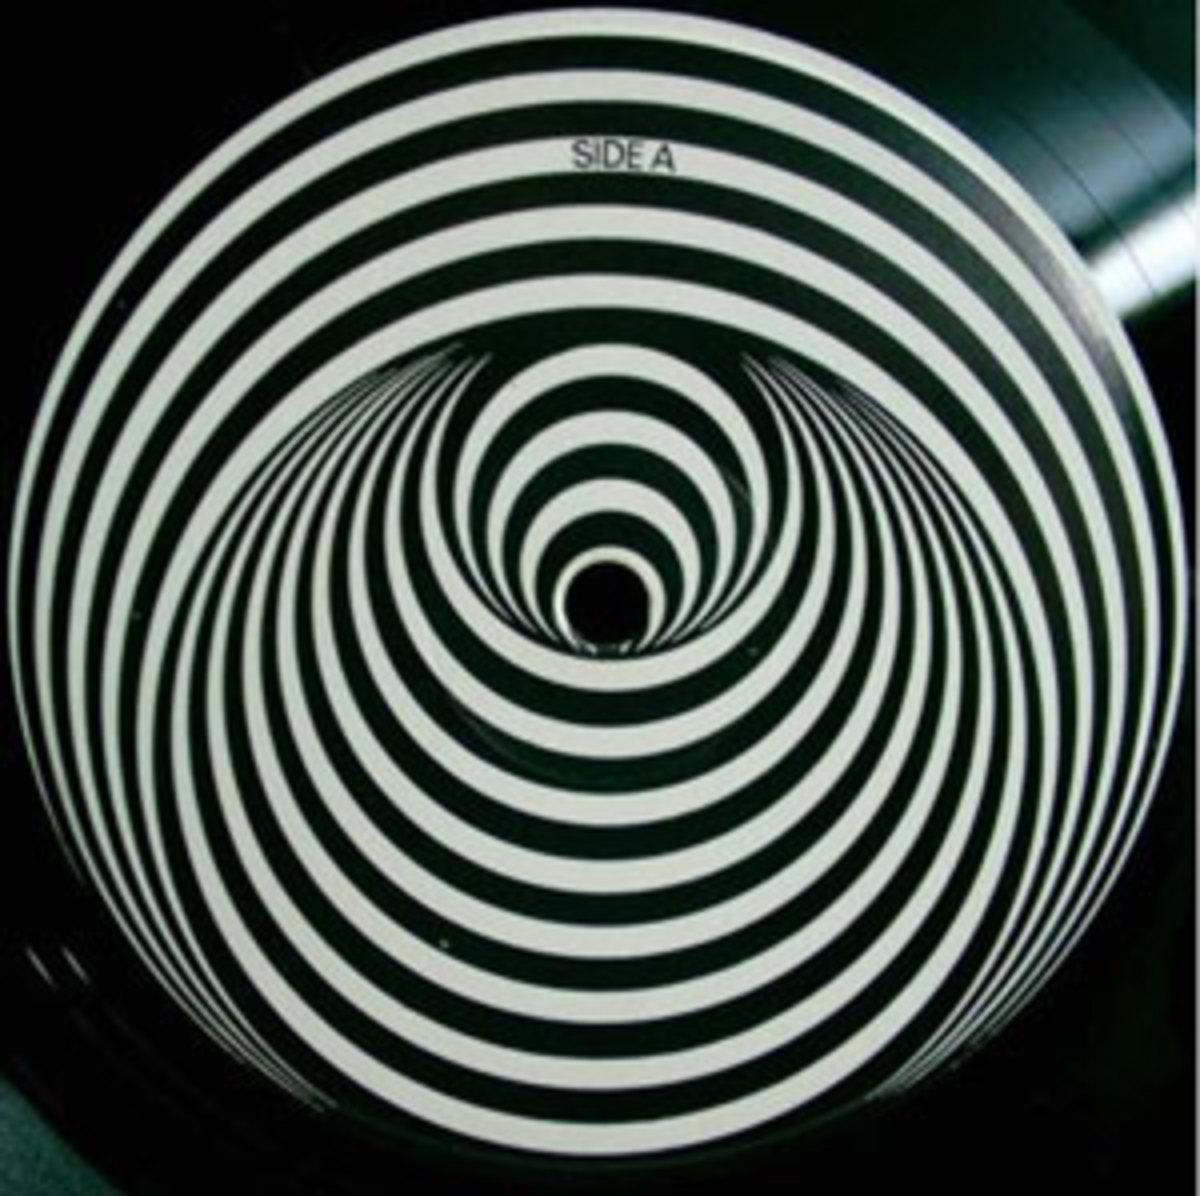 The Vertigo record label is iconic.